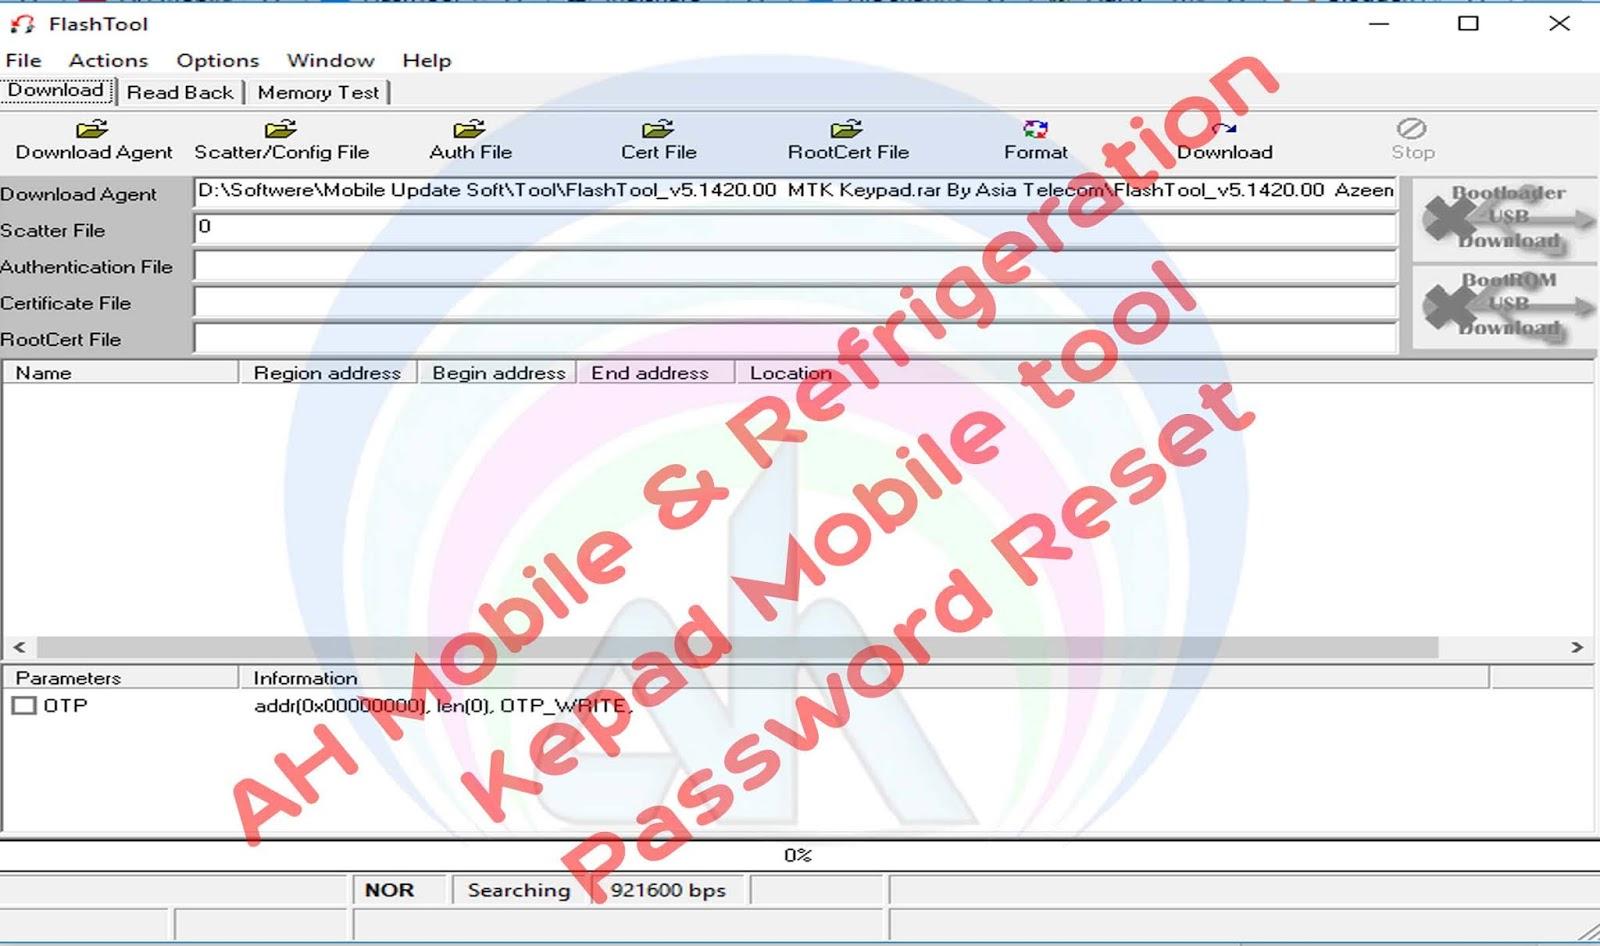 Keypad Mobile Password Unlock Flash Tool Free Download - AH